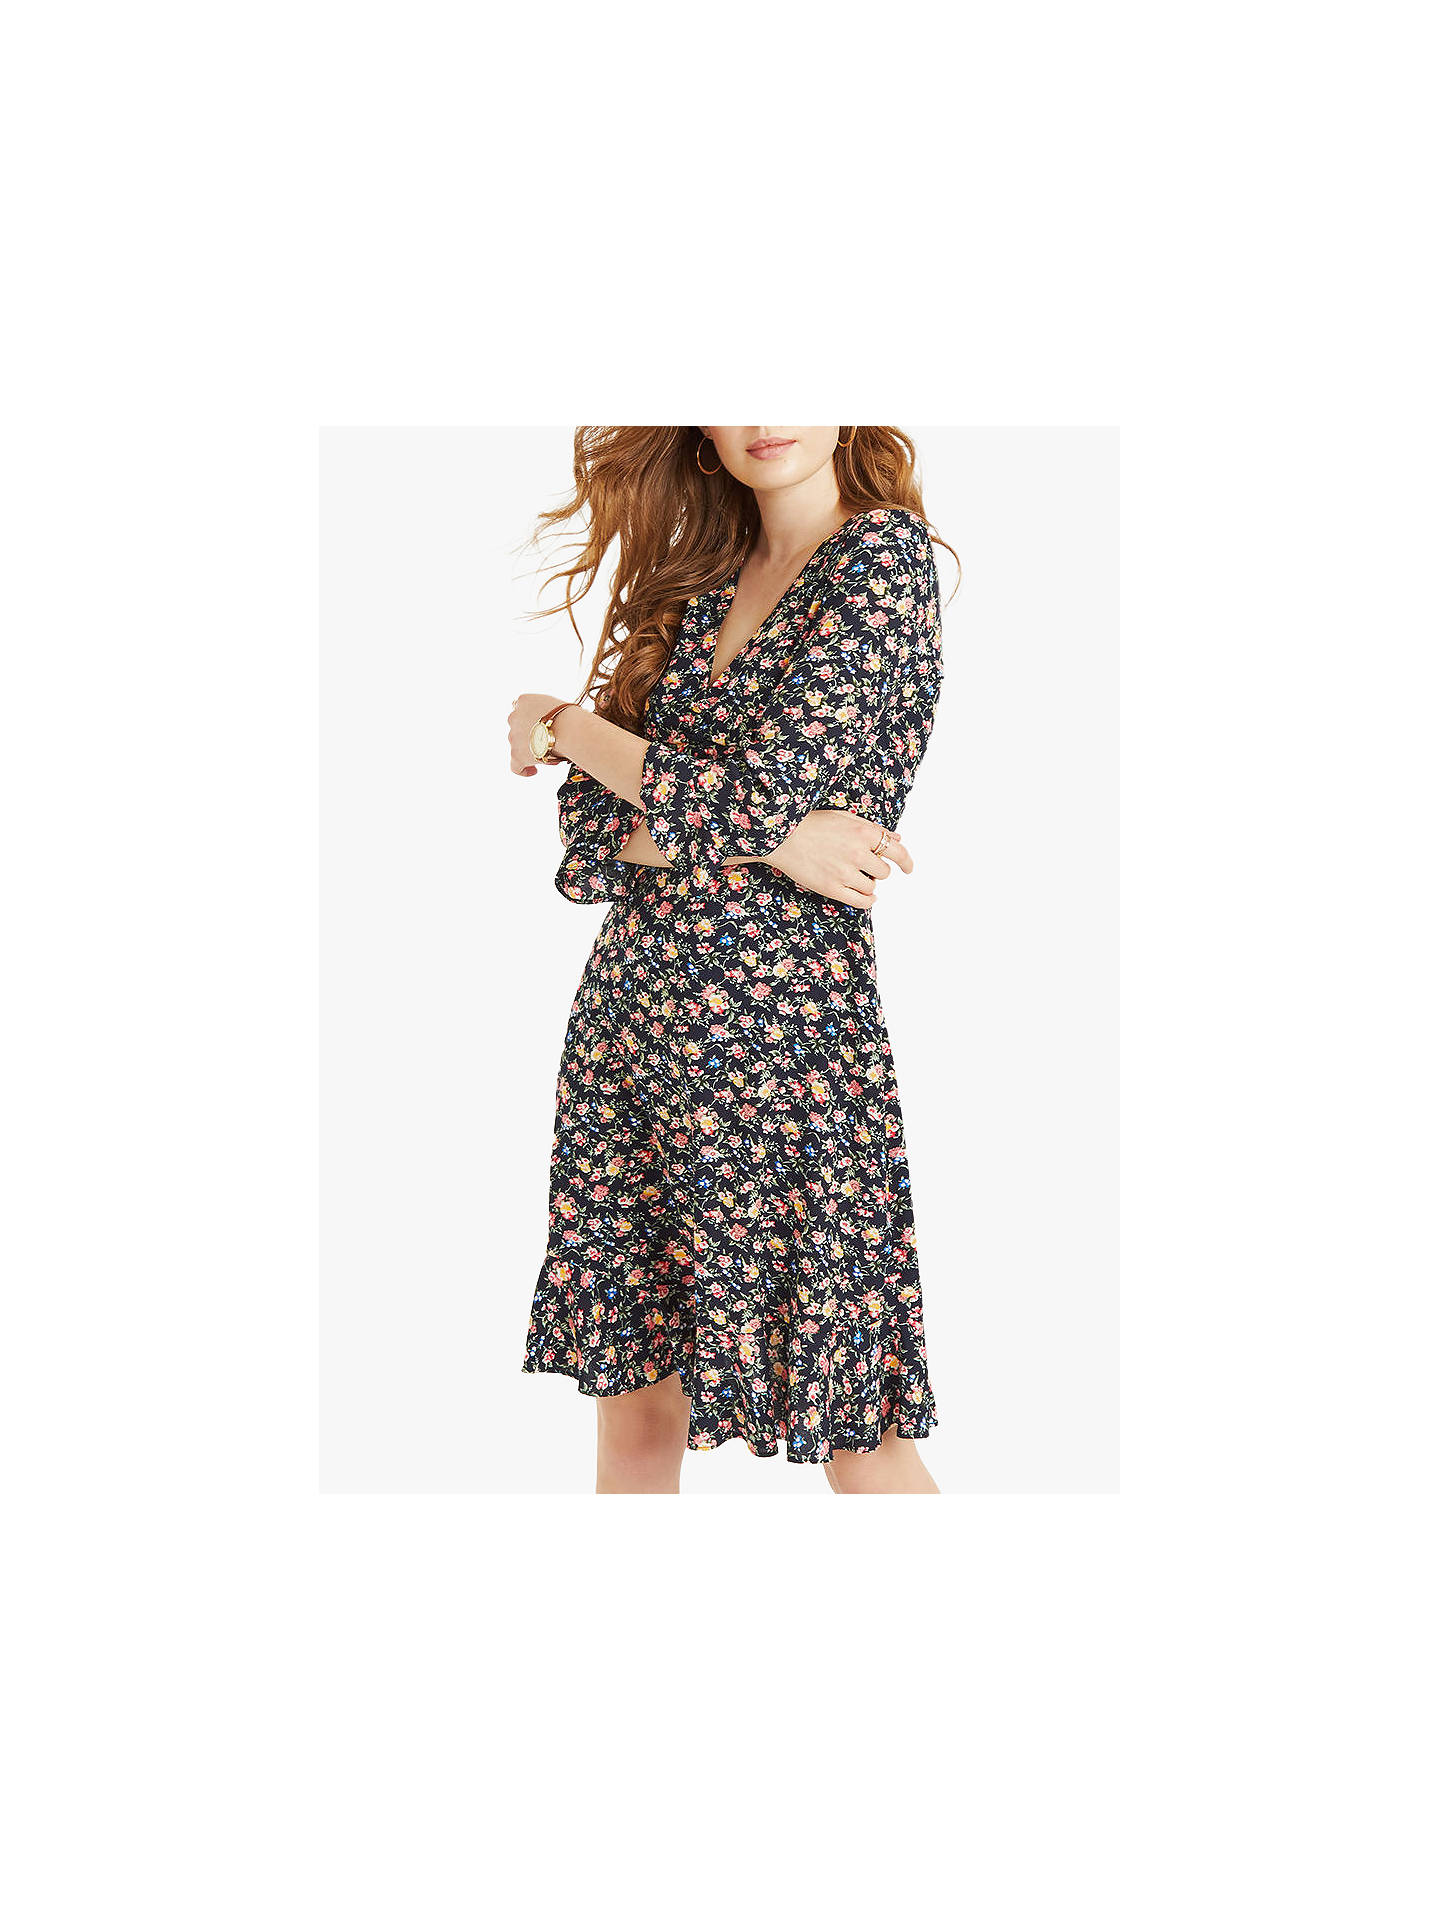 053def675ba9 Buy Oasis Garden Ditsy Skater Dress, Multi, 6R Online at johnlewis.com ...